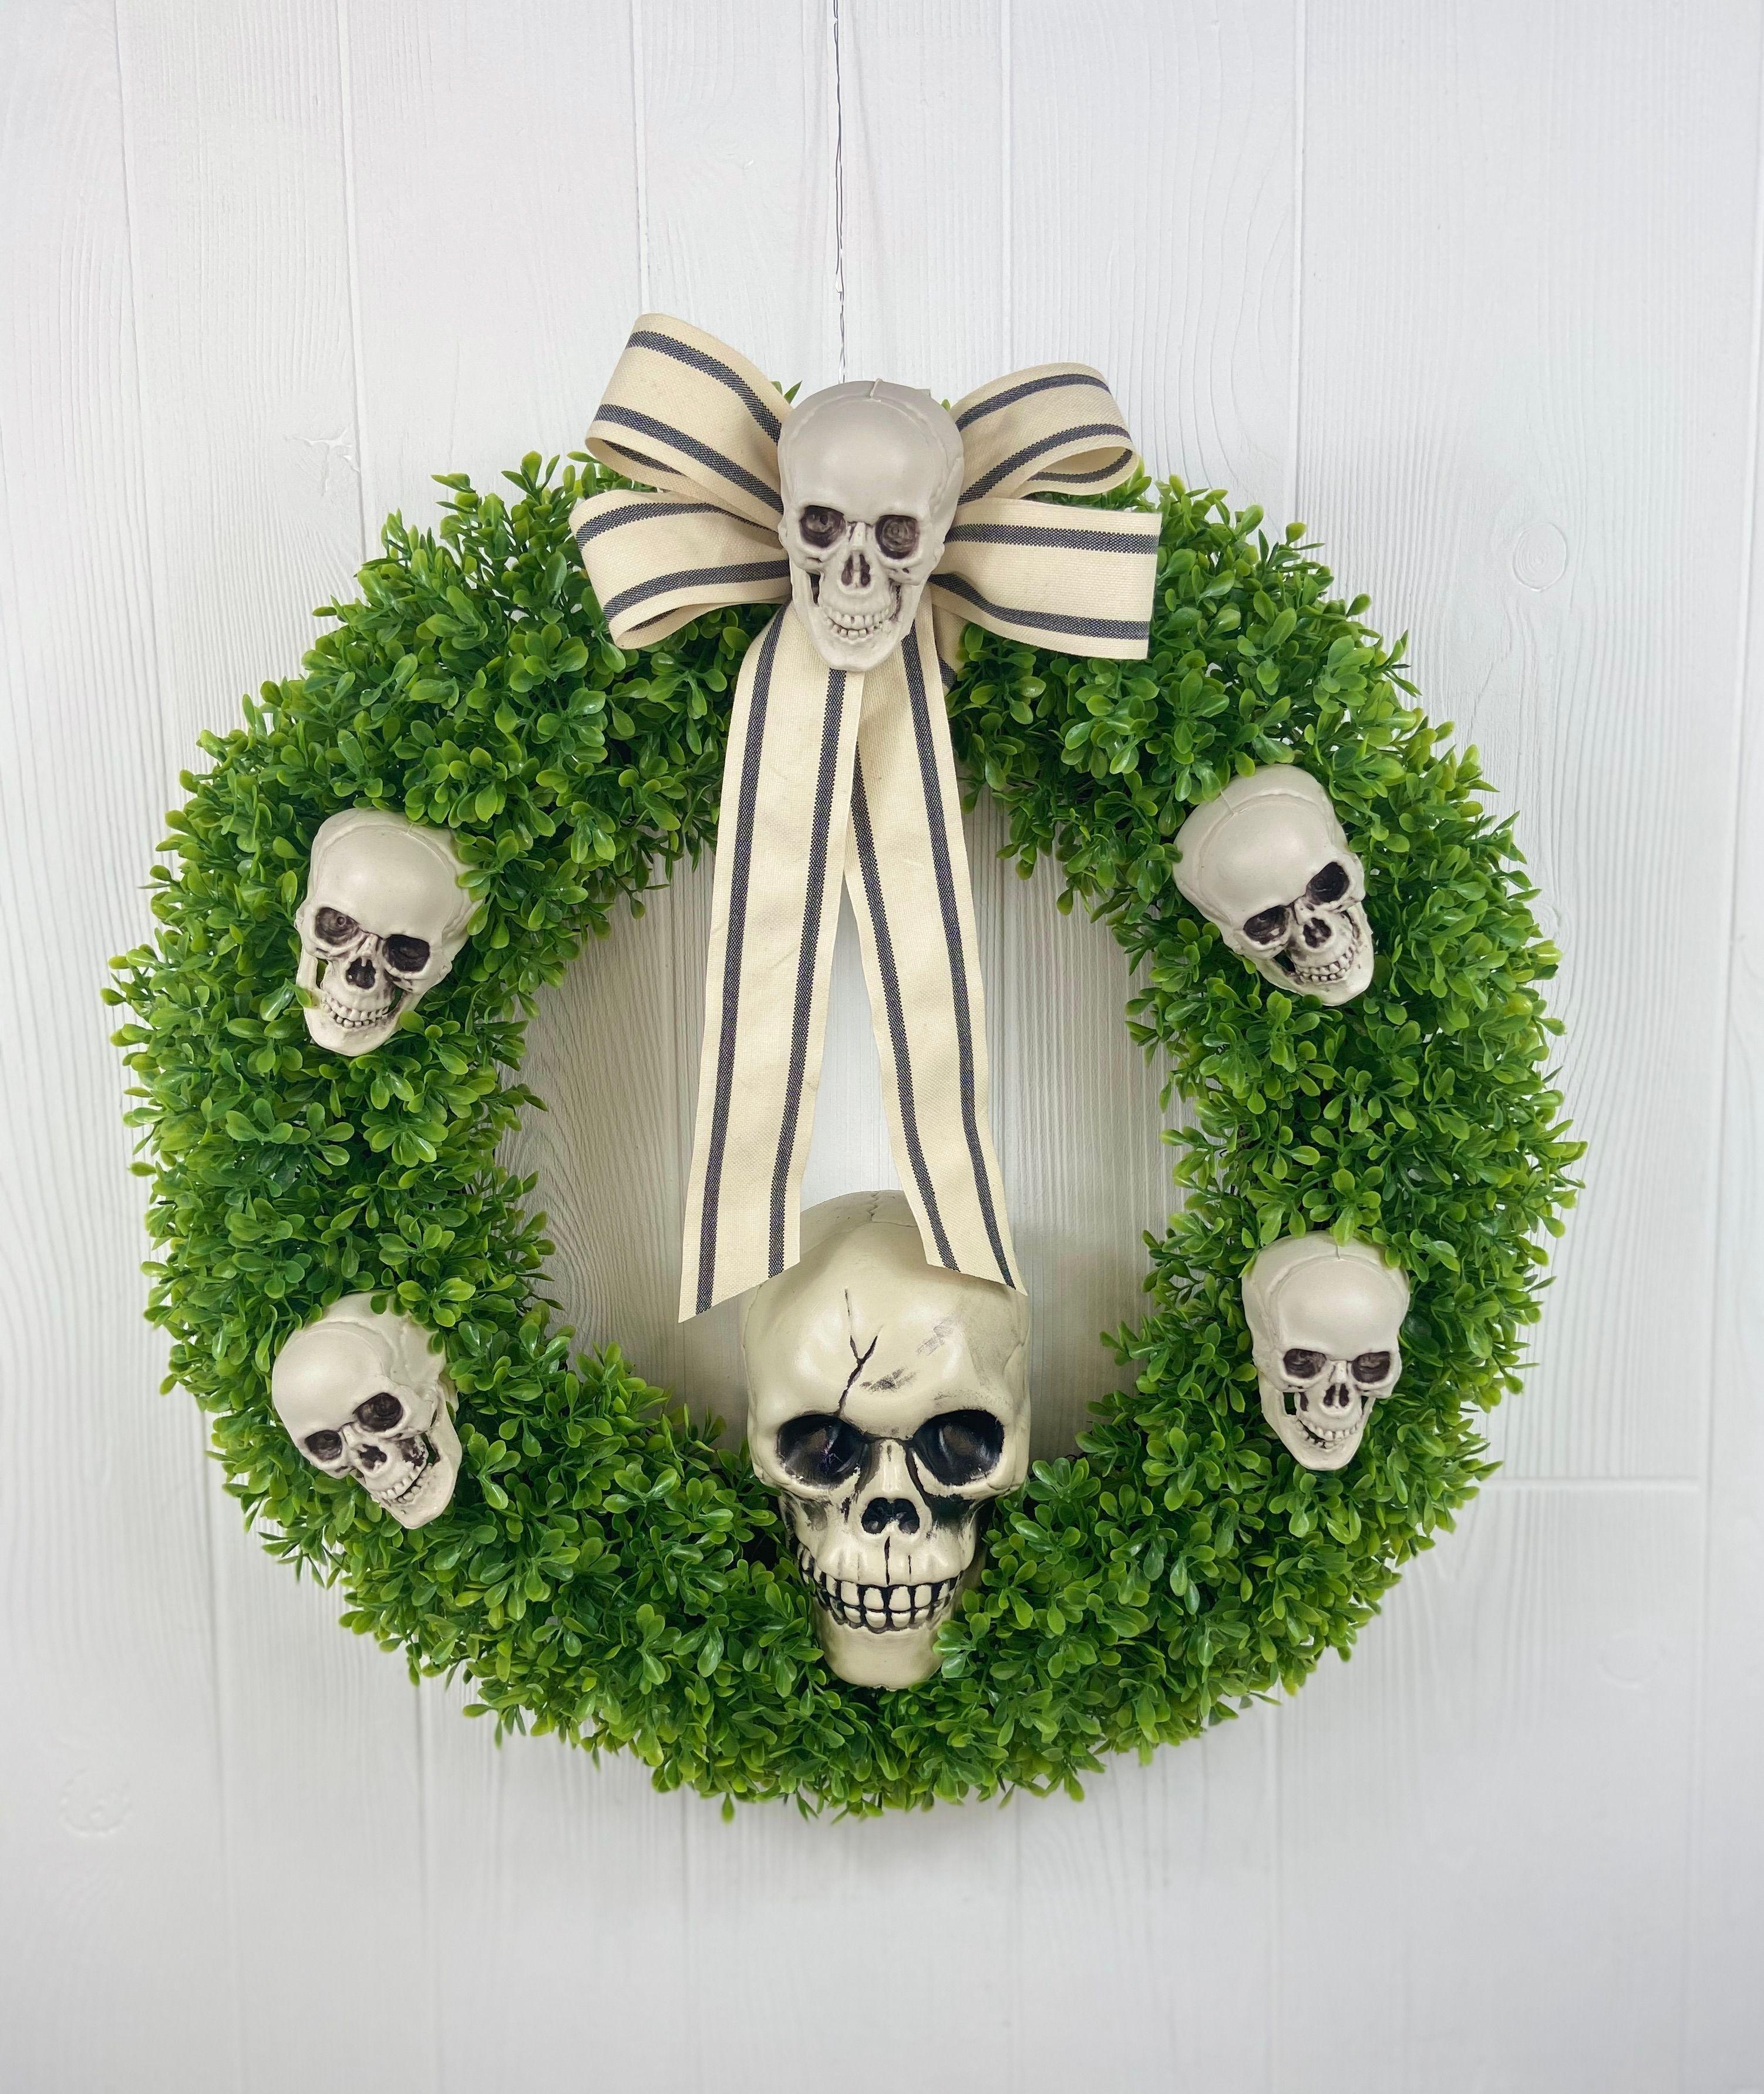 Boxwood Halloween 2020 Halloween Boxwood Wreath with Skulls in 2020 | Halloween